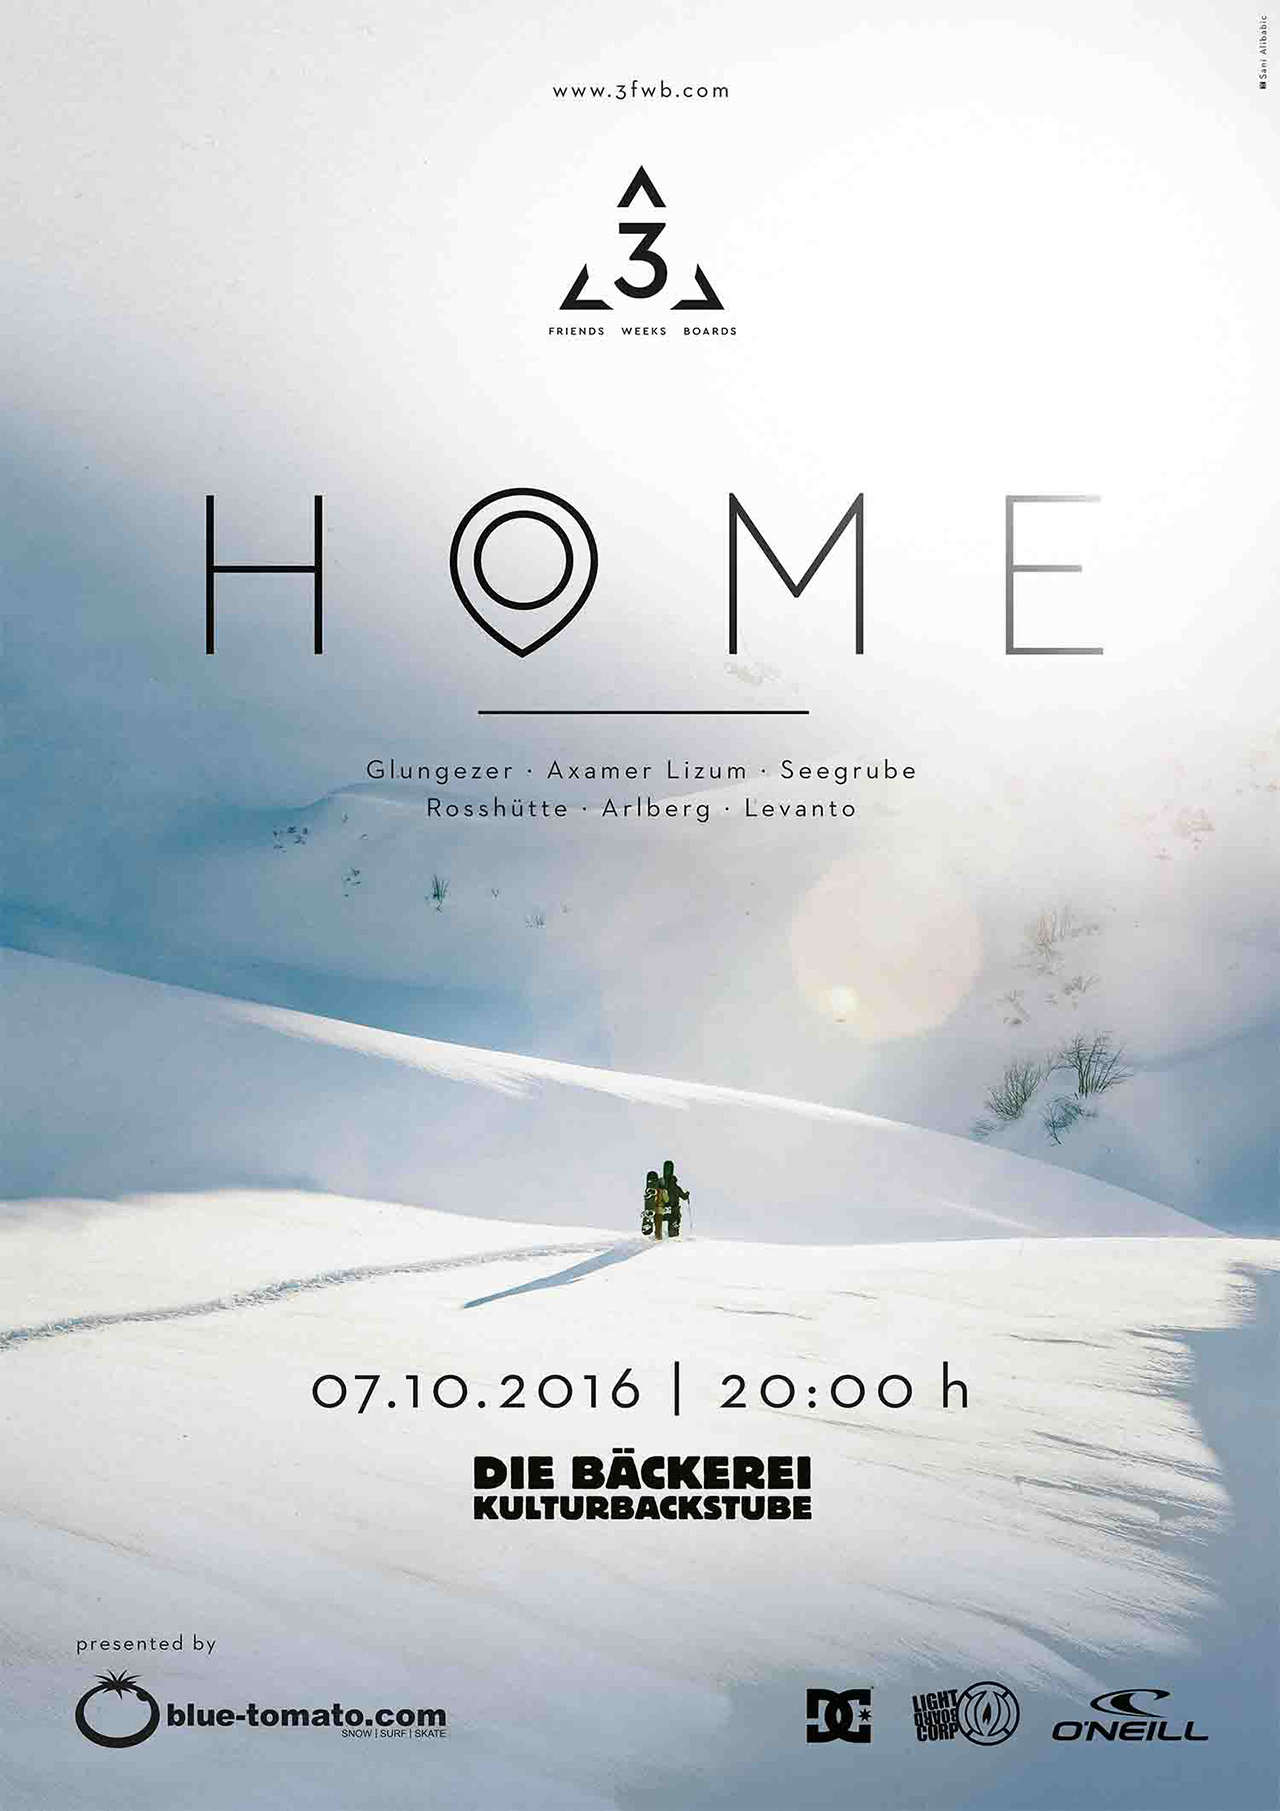 prime-snowboarding-3fwb-home-premiere-04